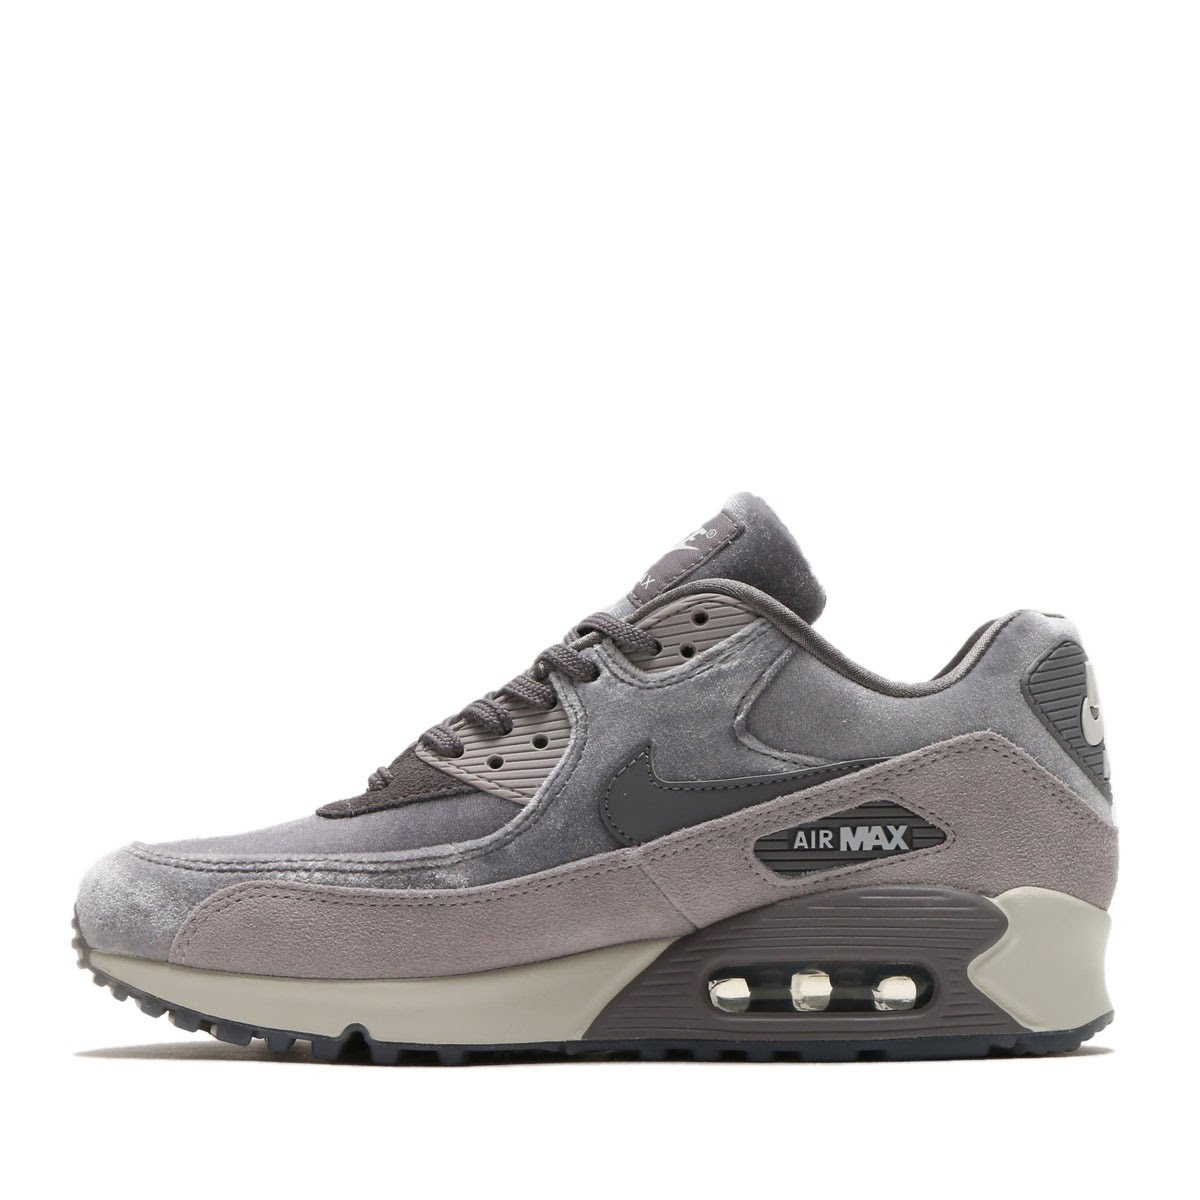 check out 58245 d1284 NIKE WMNS AIR MAX 90 LX (Nike women Air Max 90 LX) (GUNSMOKEGUNSMOKE-ATMOSPHERE  GREY) 18SP-S